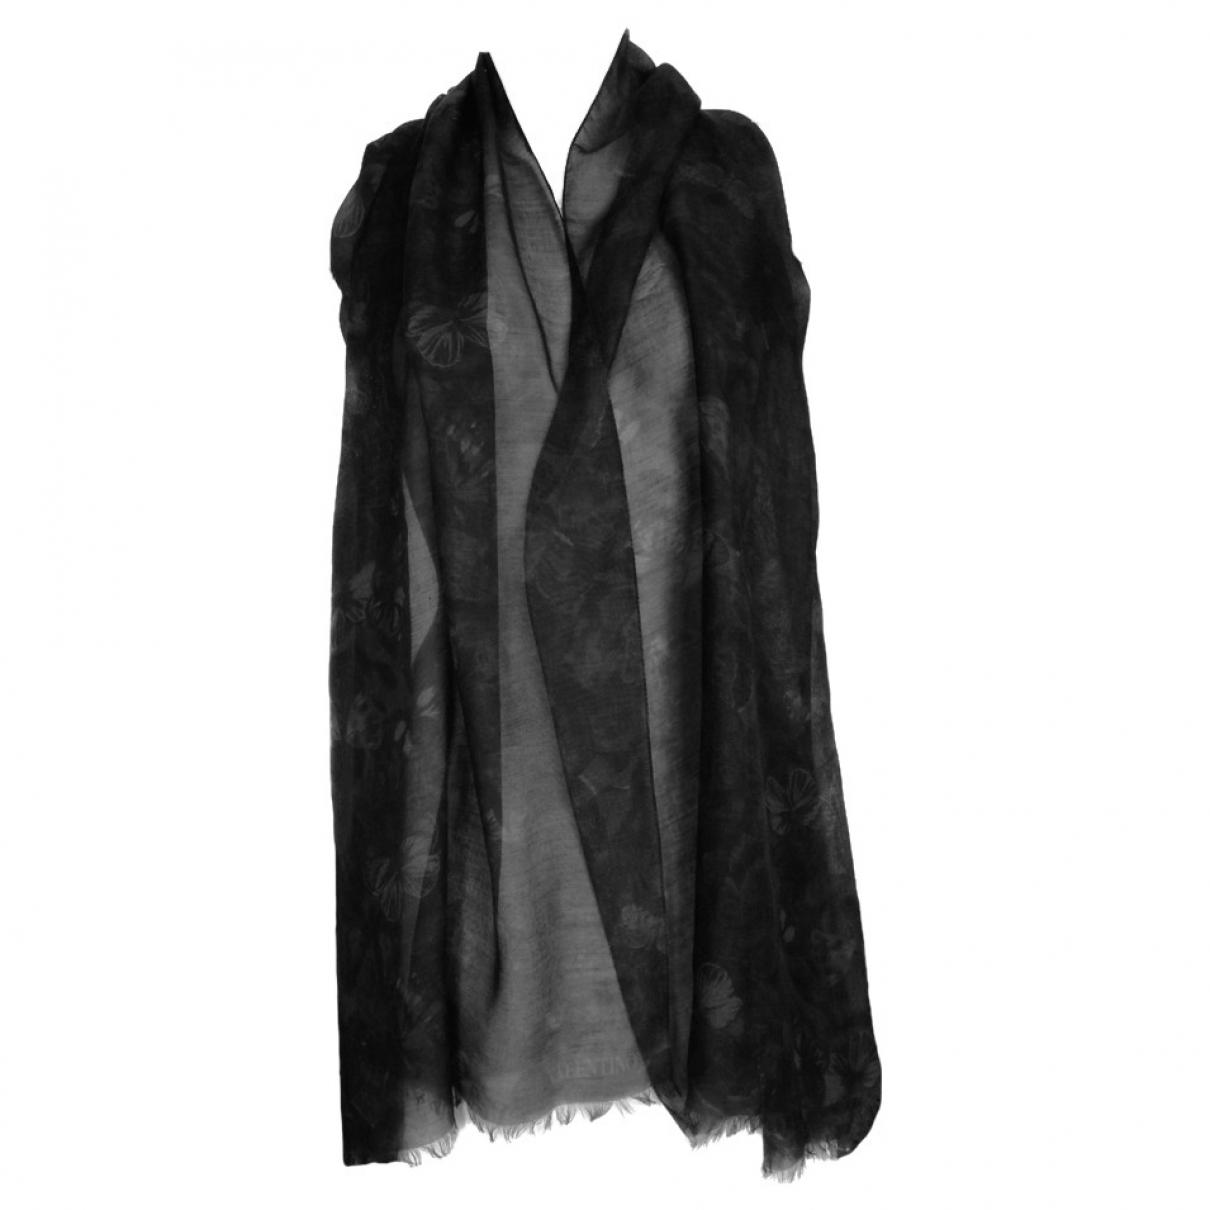 Valentino Garavani \N Black Cashmere scarf for Women \N